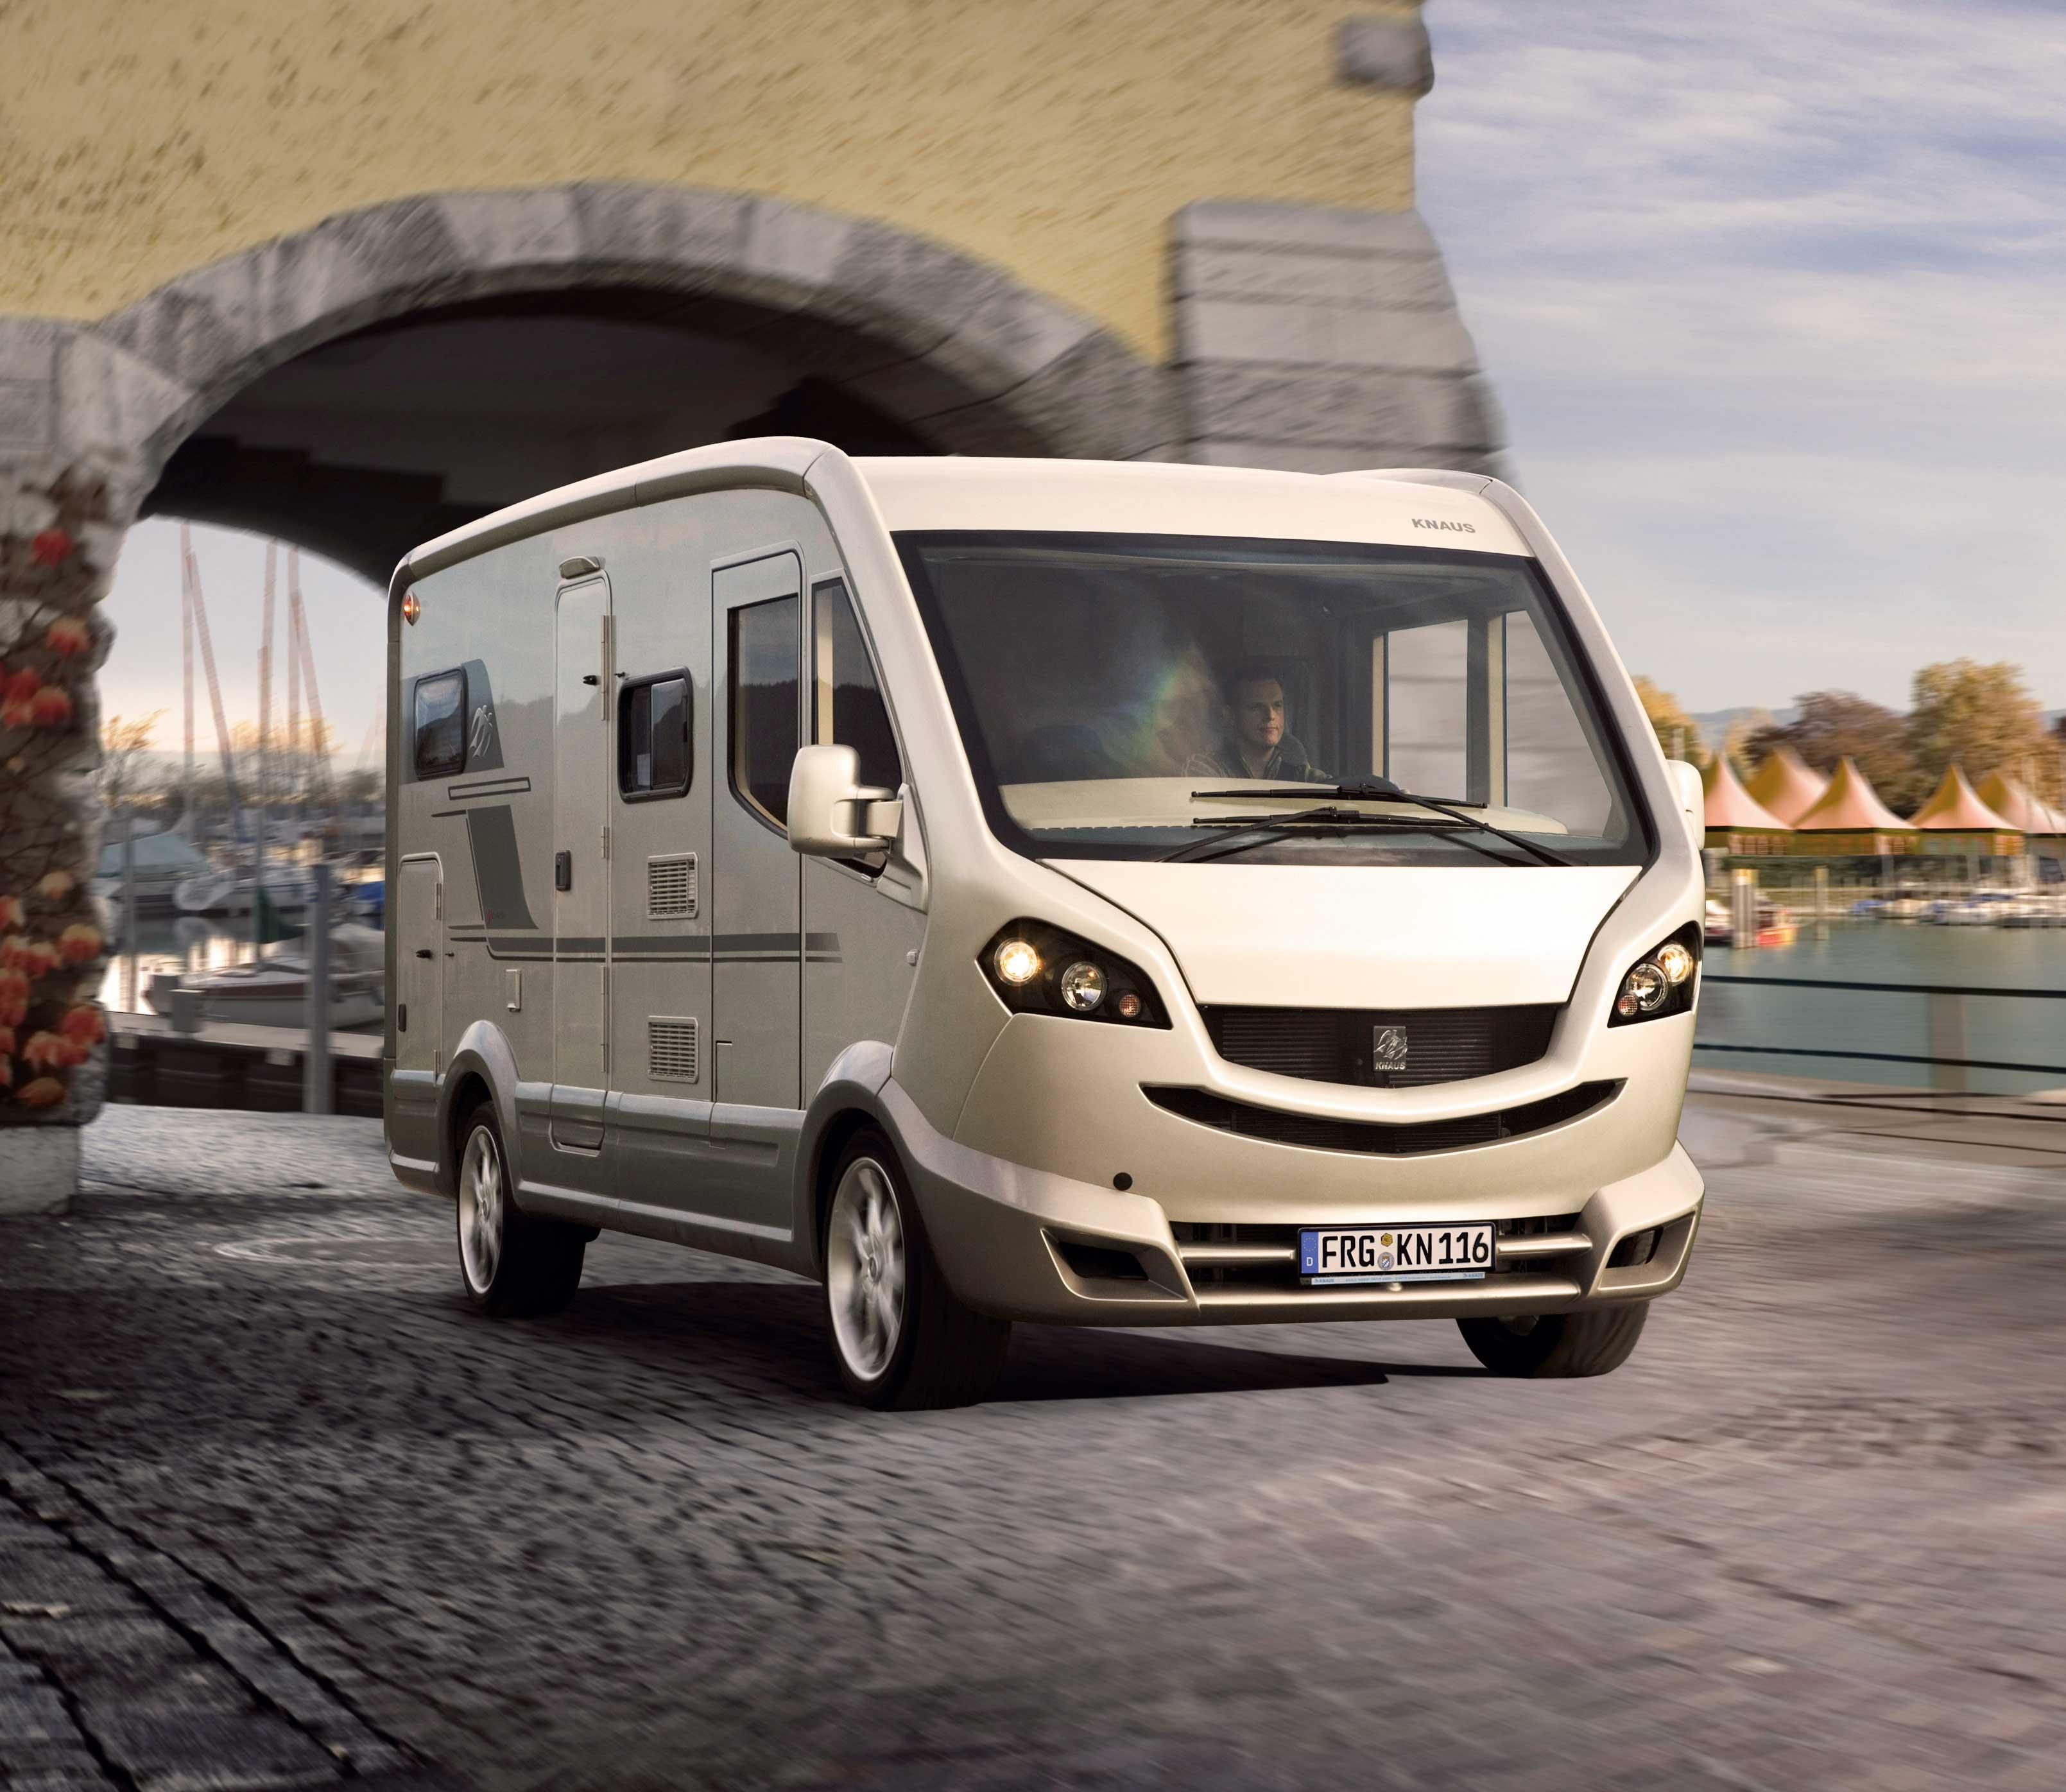 Knaus Caravan Exterieur